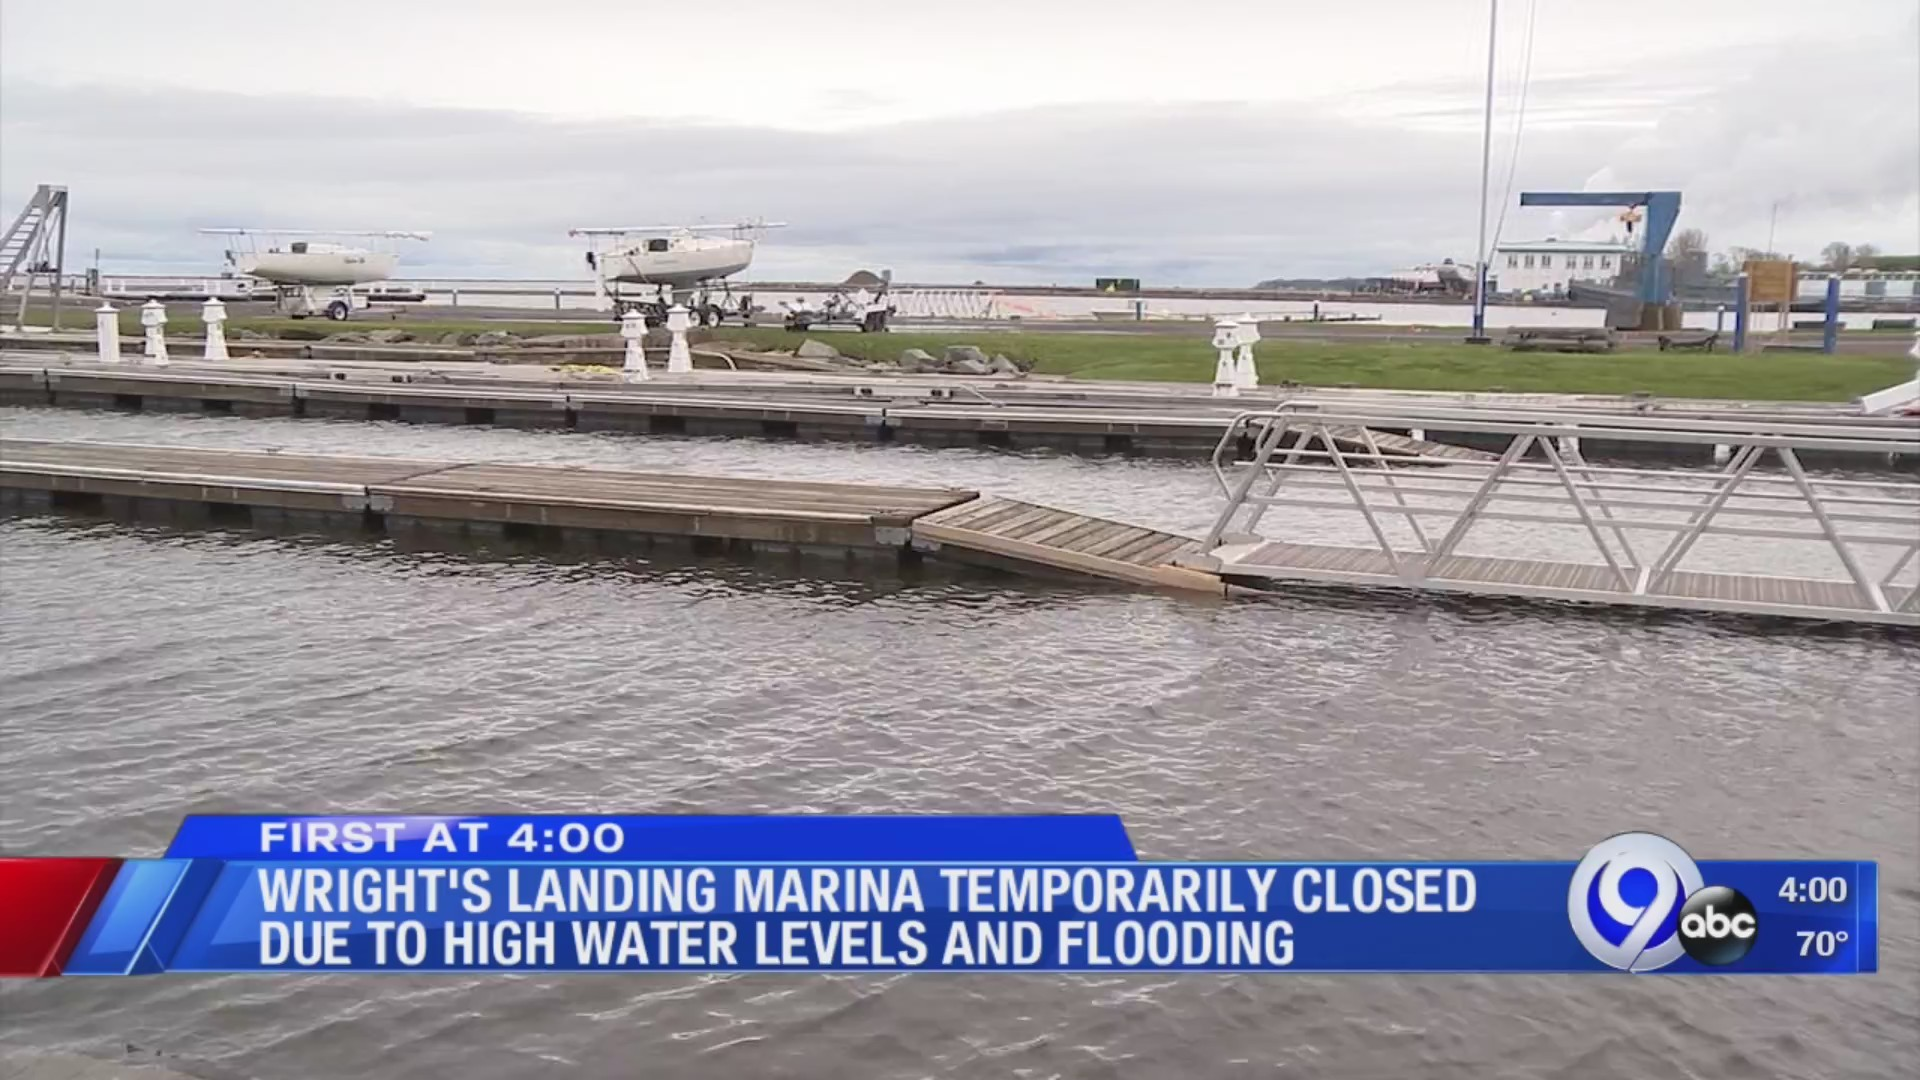 Wright_s_Landing_Marina_in_Oswego_closed_0_20190530200431